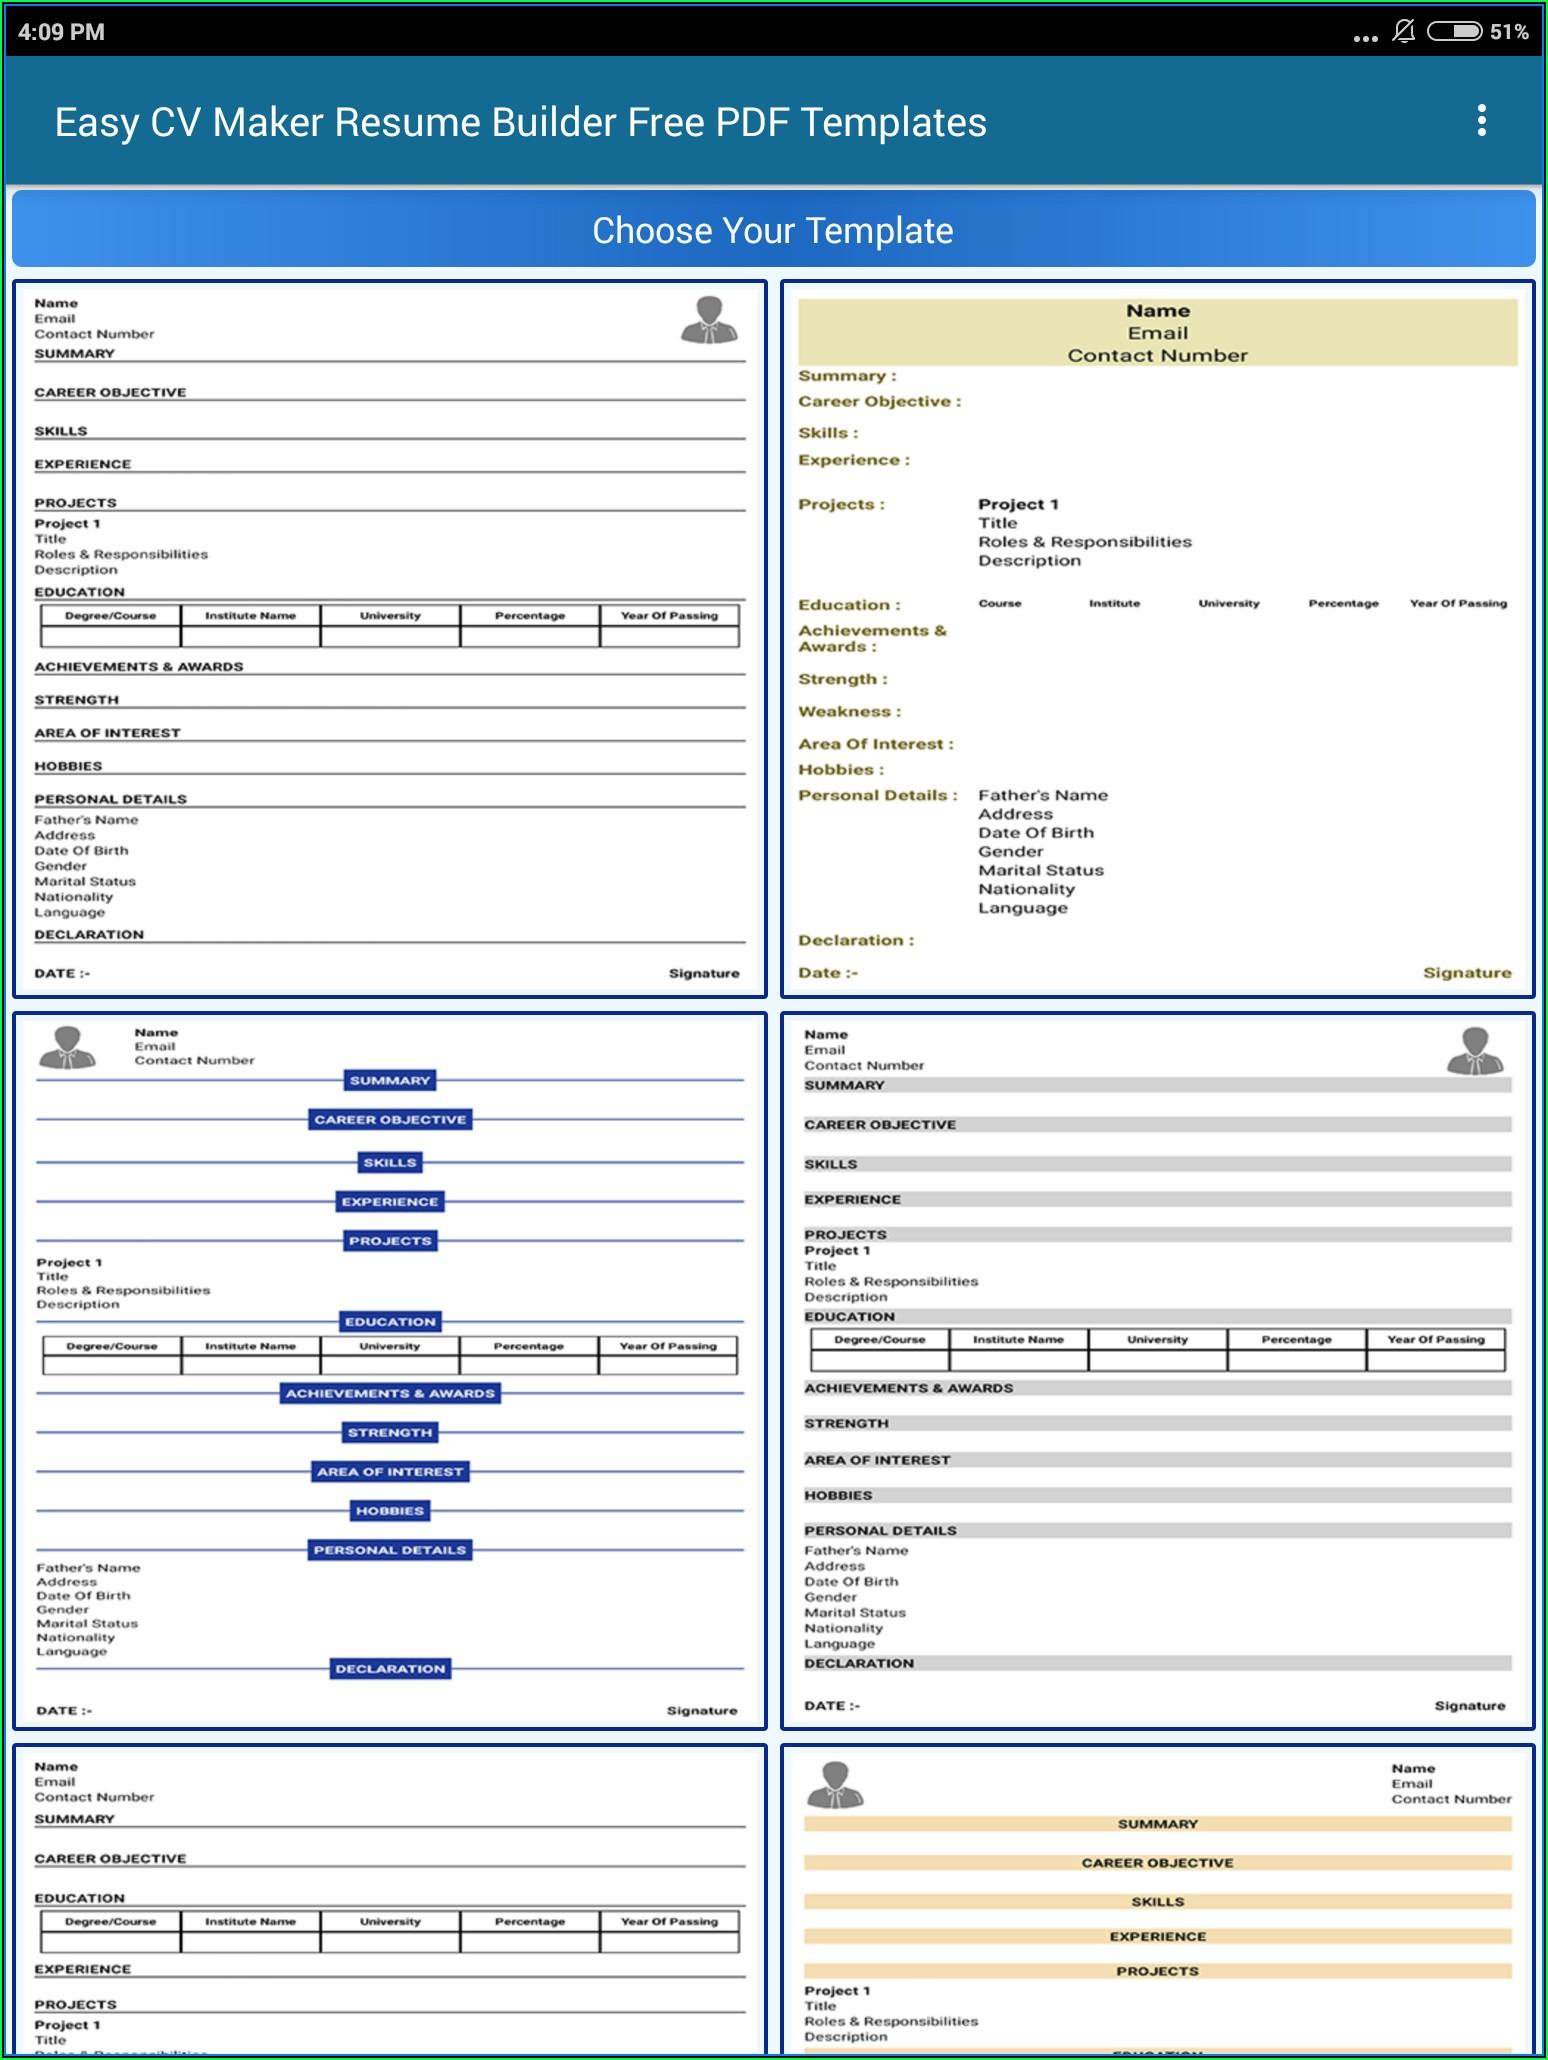 Free Easy Resume Builder Templates